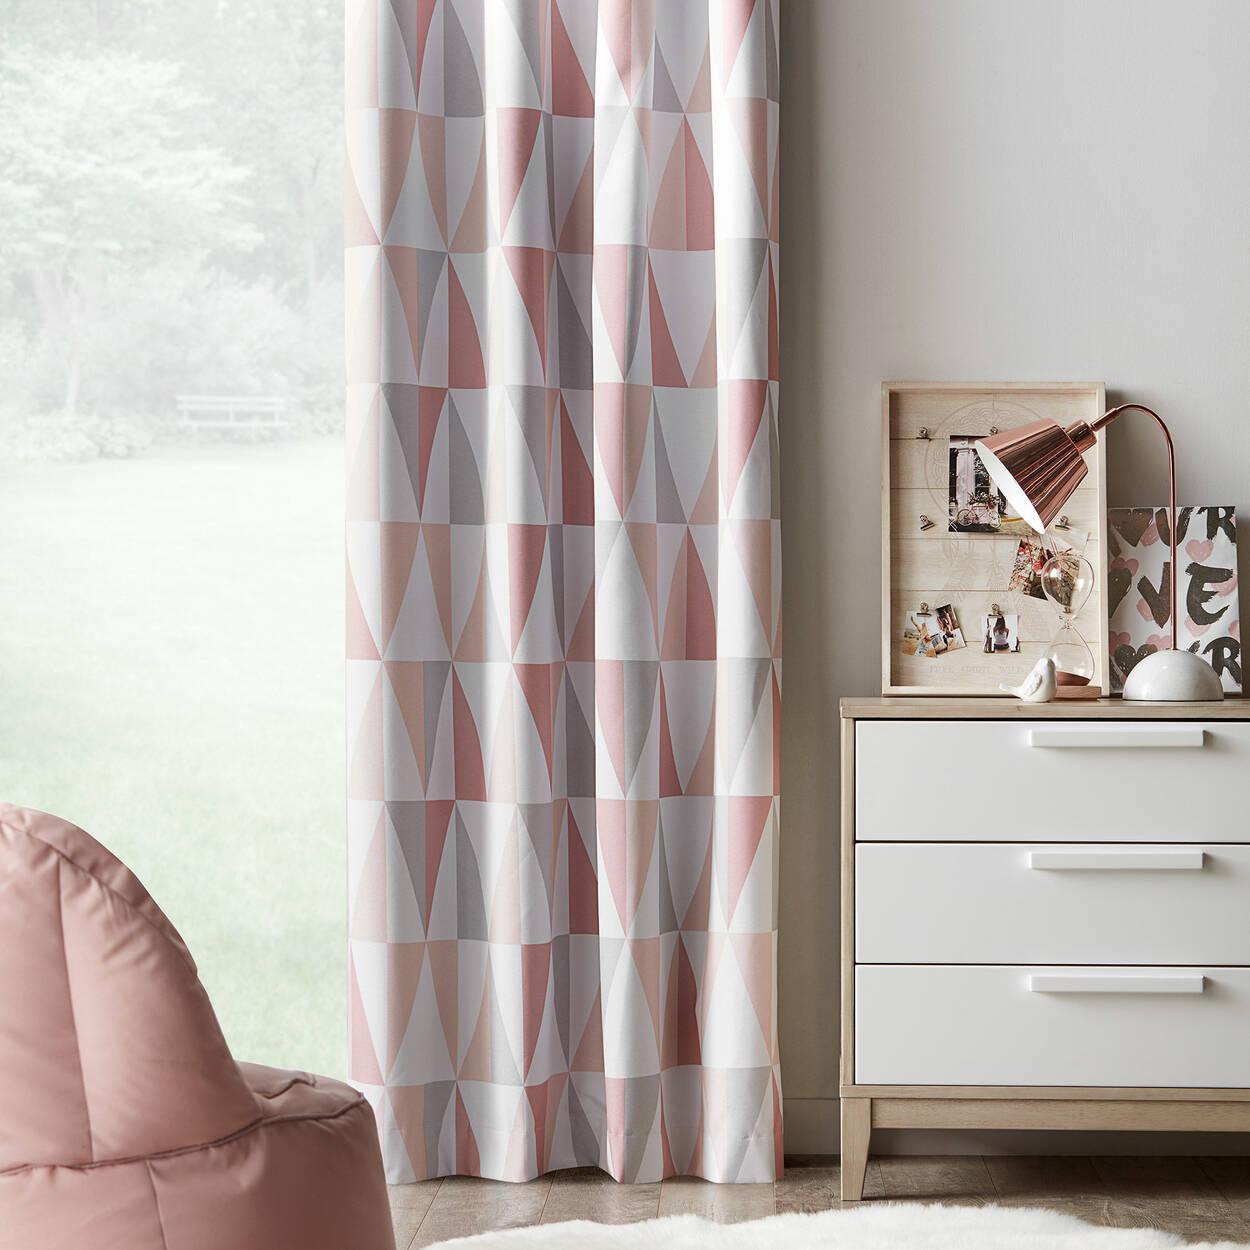 rideau coupe lumi re motif g om trique trekant. Black Bedroom Furniture Sets. Home Design Ideas